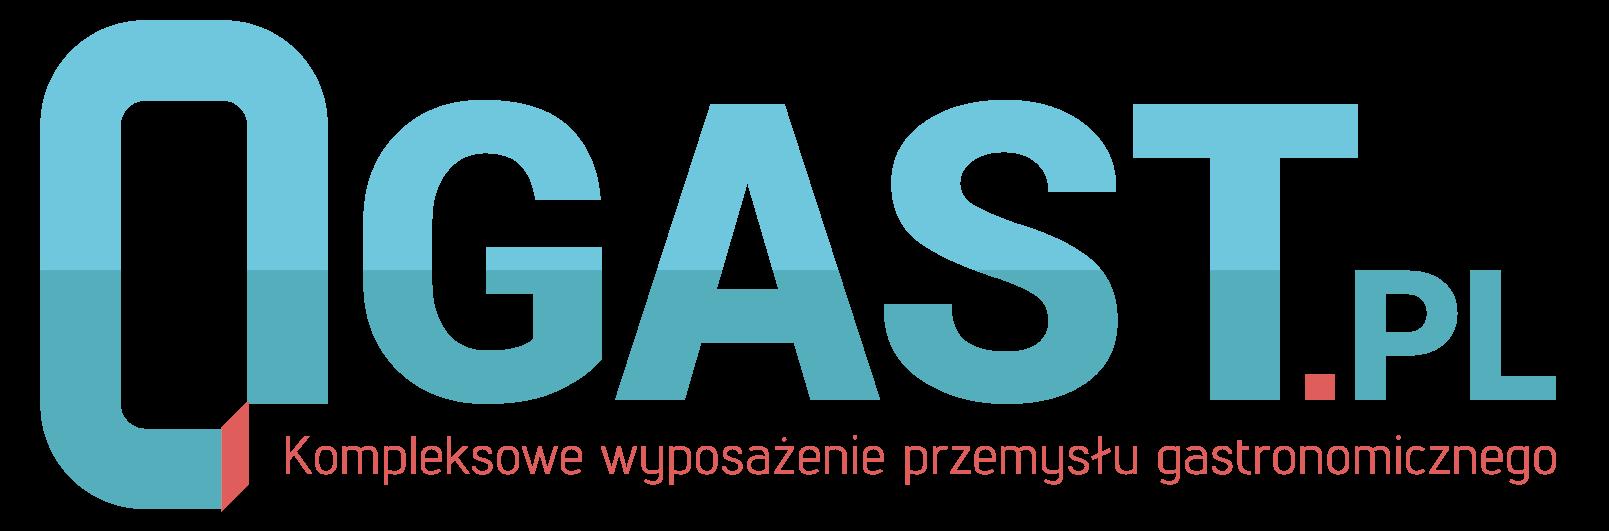 SprzÄ™t gastronomiczny KrakĂłw - QGAST.PL